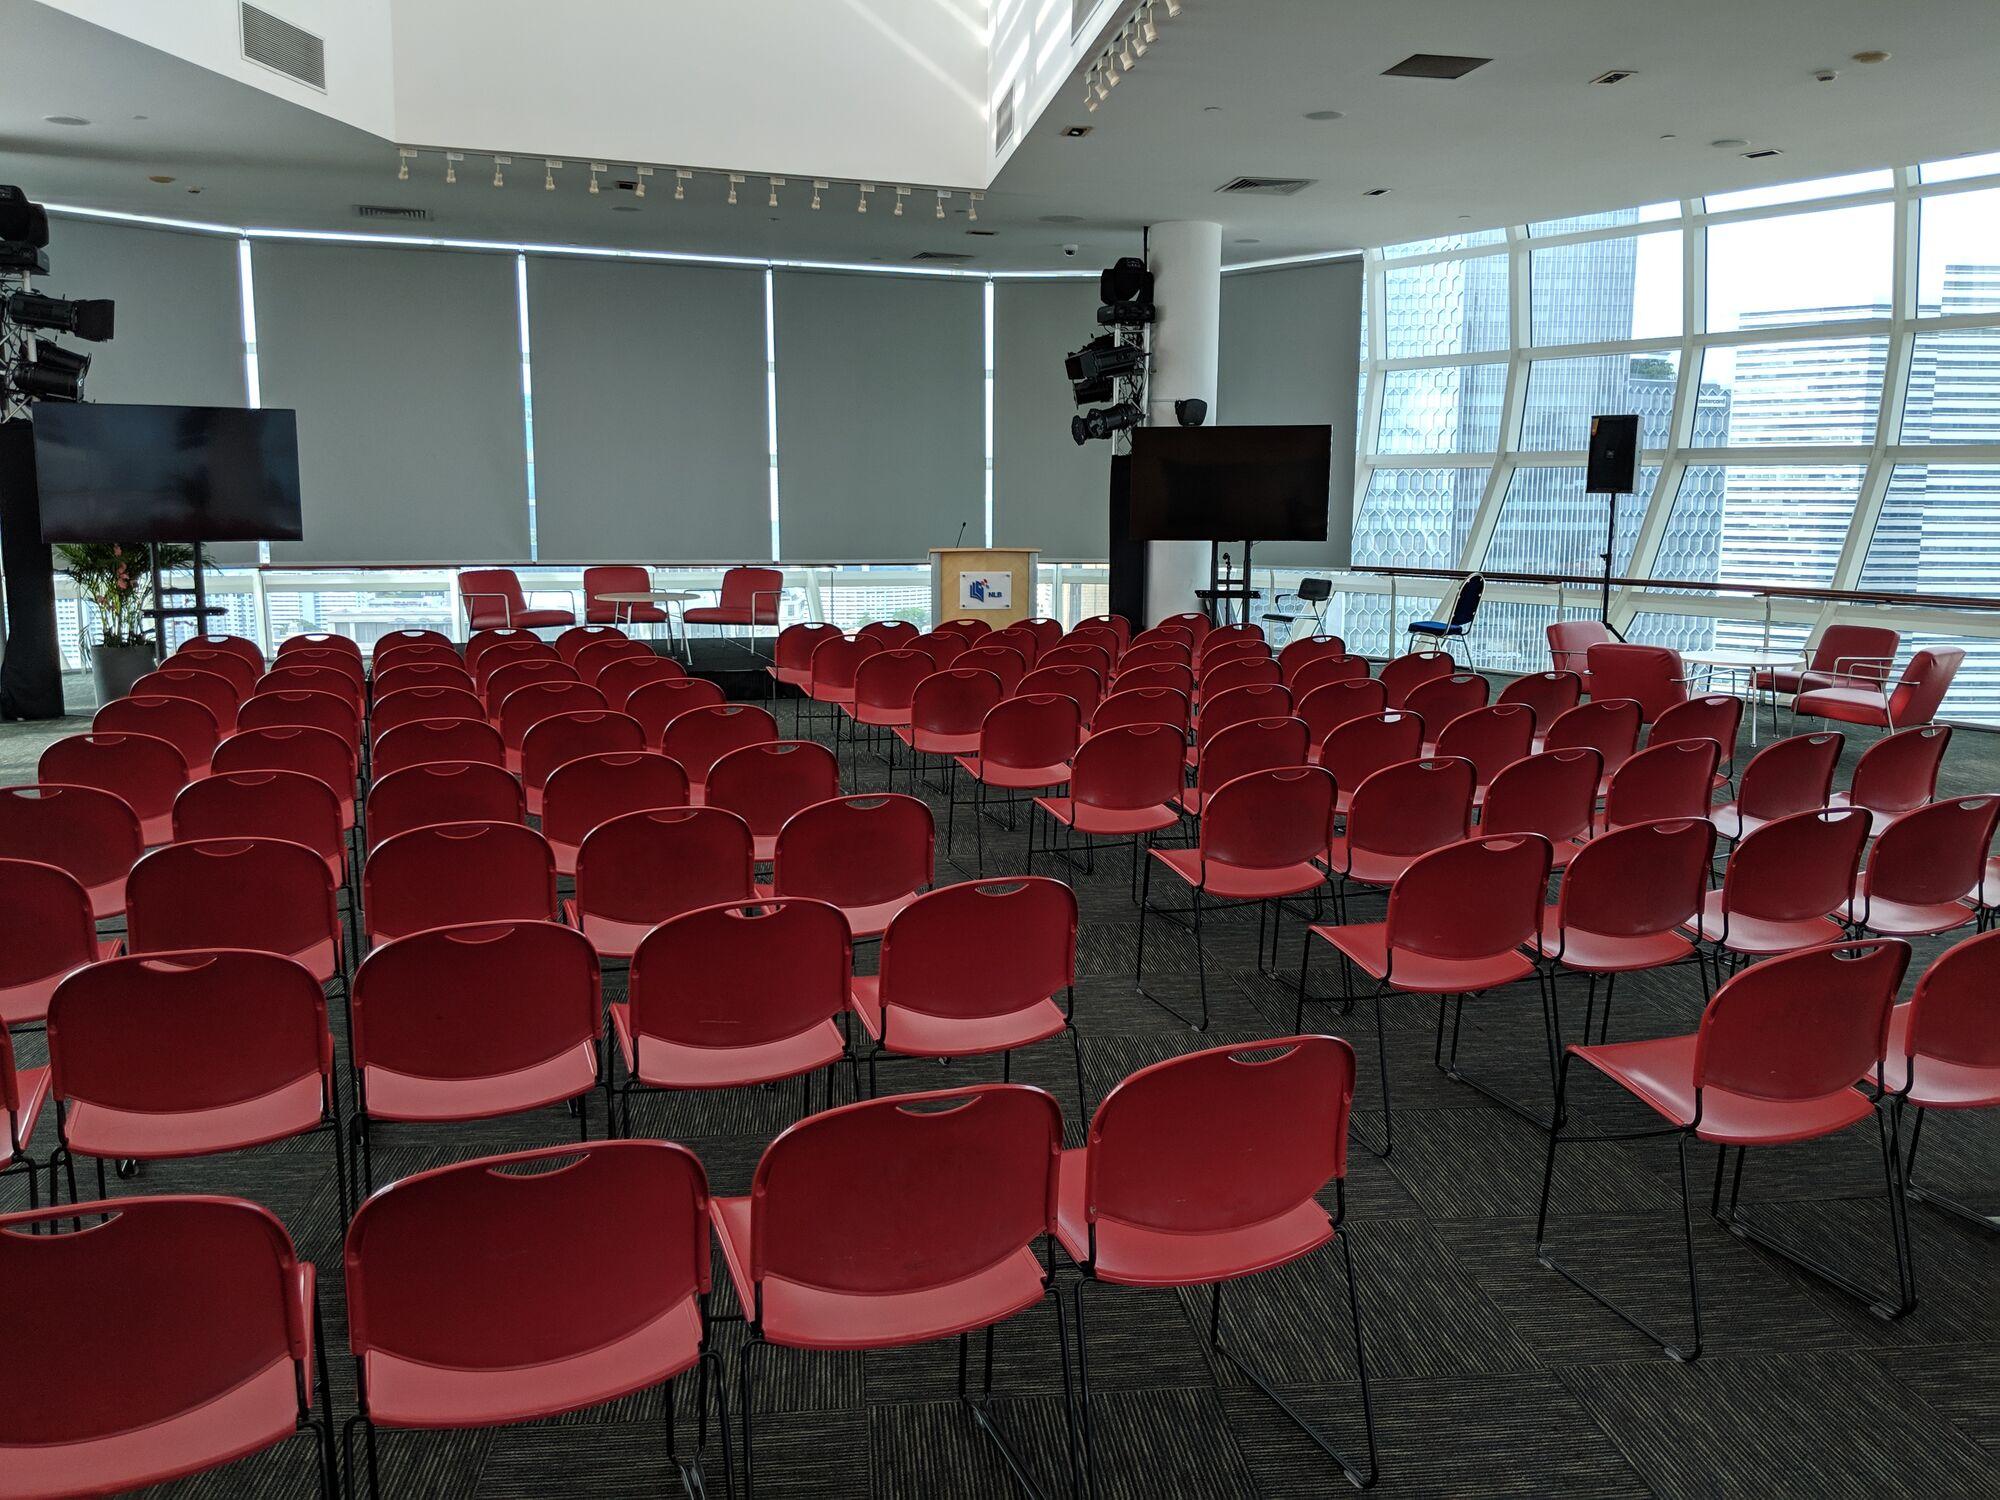 The top floor has a meeting room